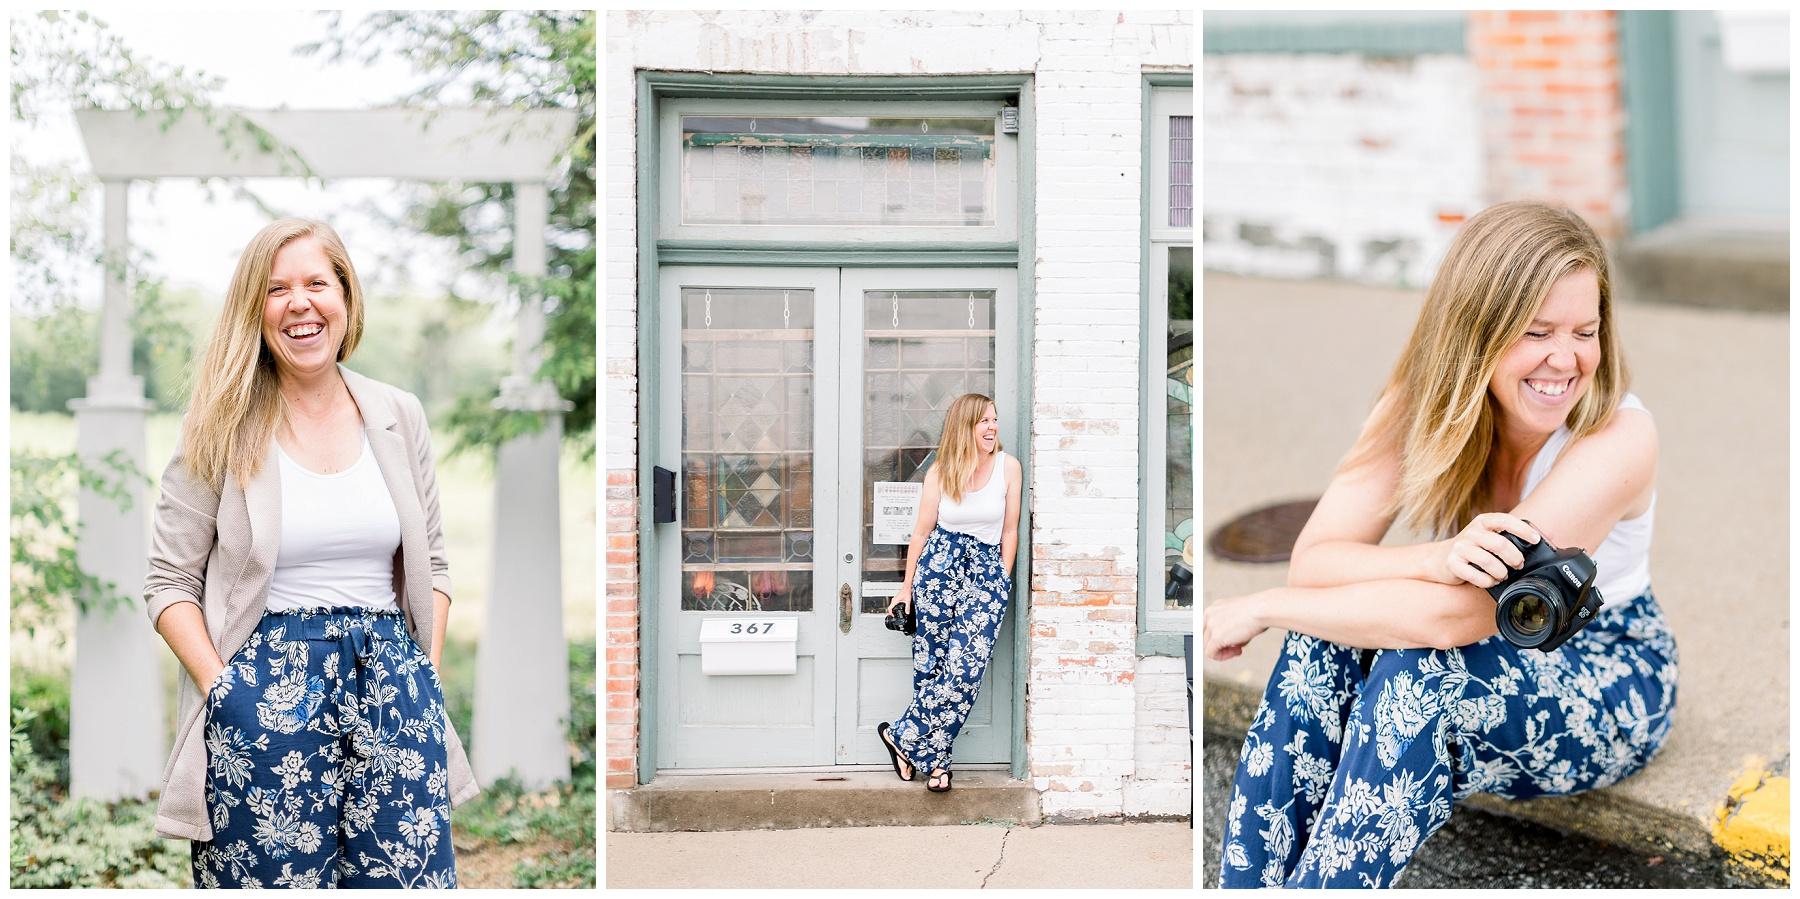 Wedding-Photography-Coaching-Mentoring-Kansas-City-by-Elizabeth-Ladean-Photography_photo-_8572.jpg